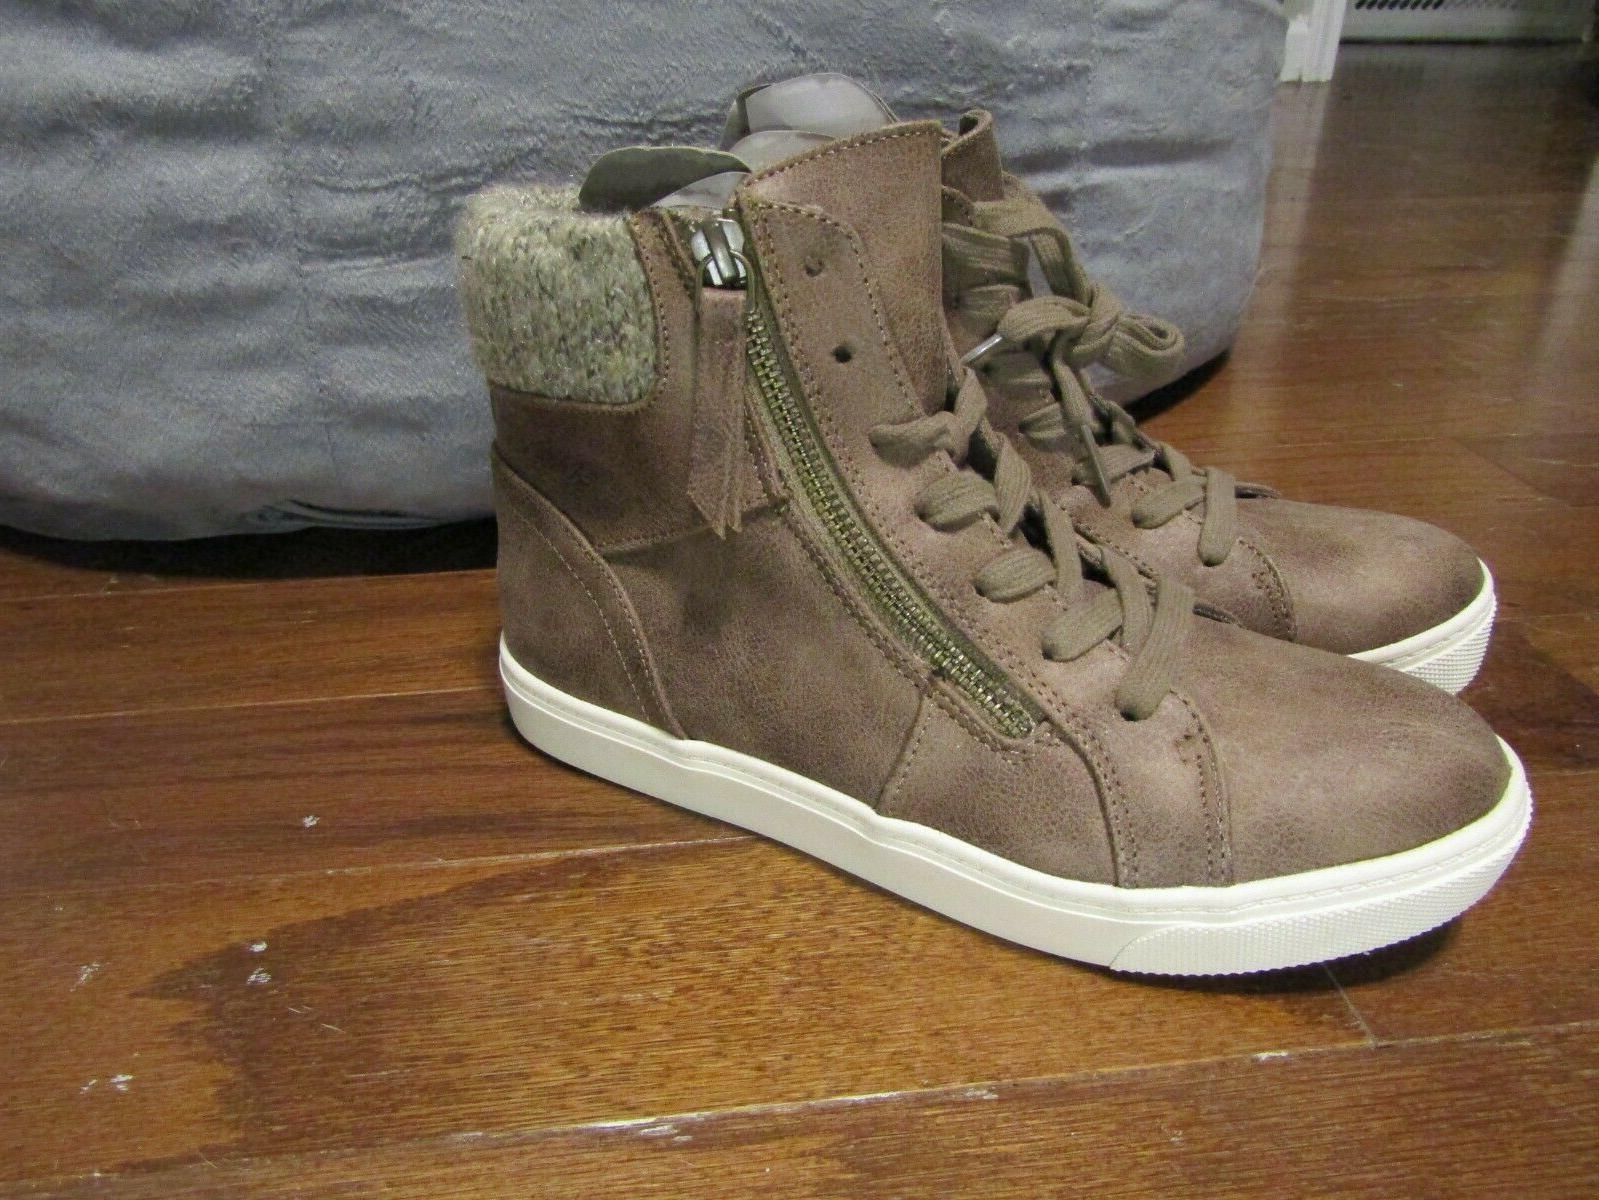 Curfew Hi Top Casual Boots Girls Size